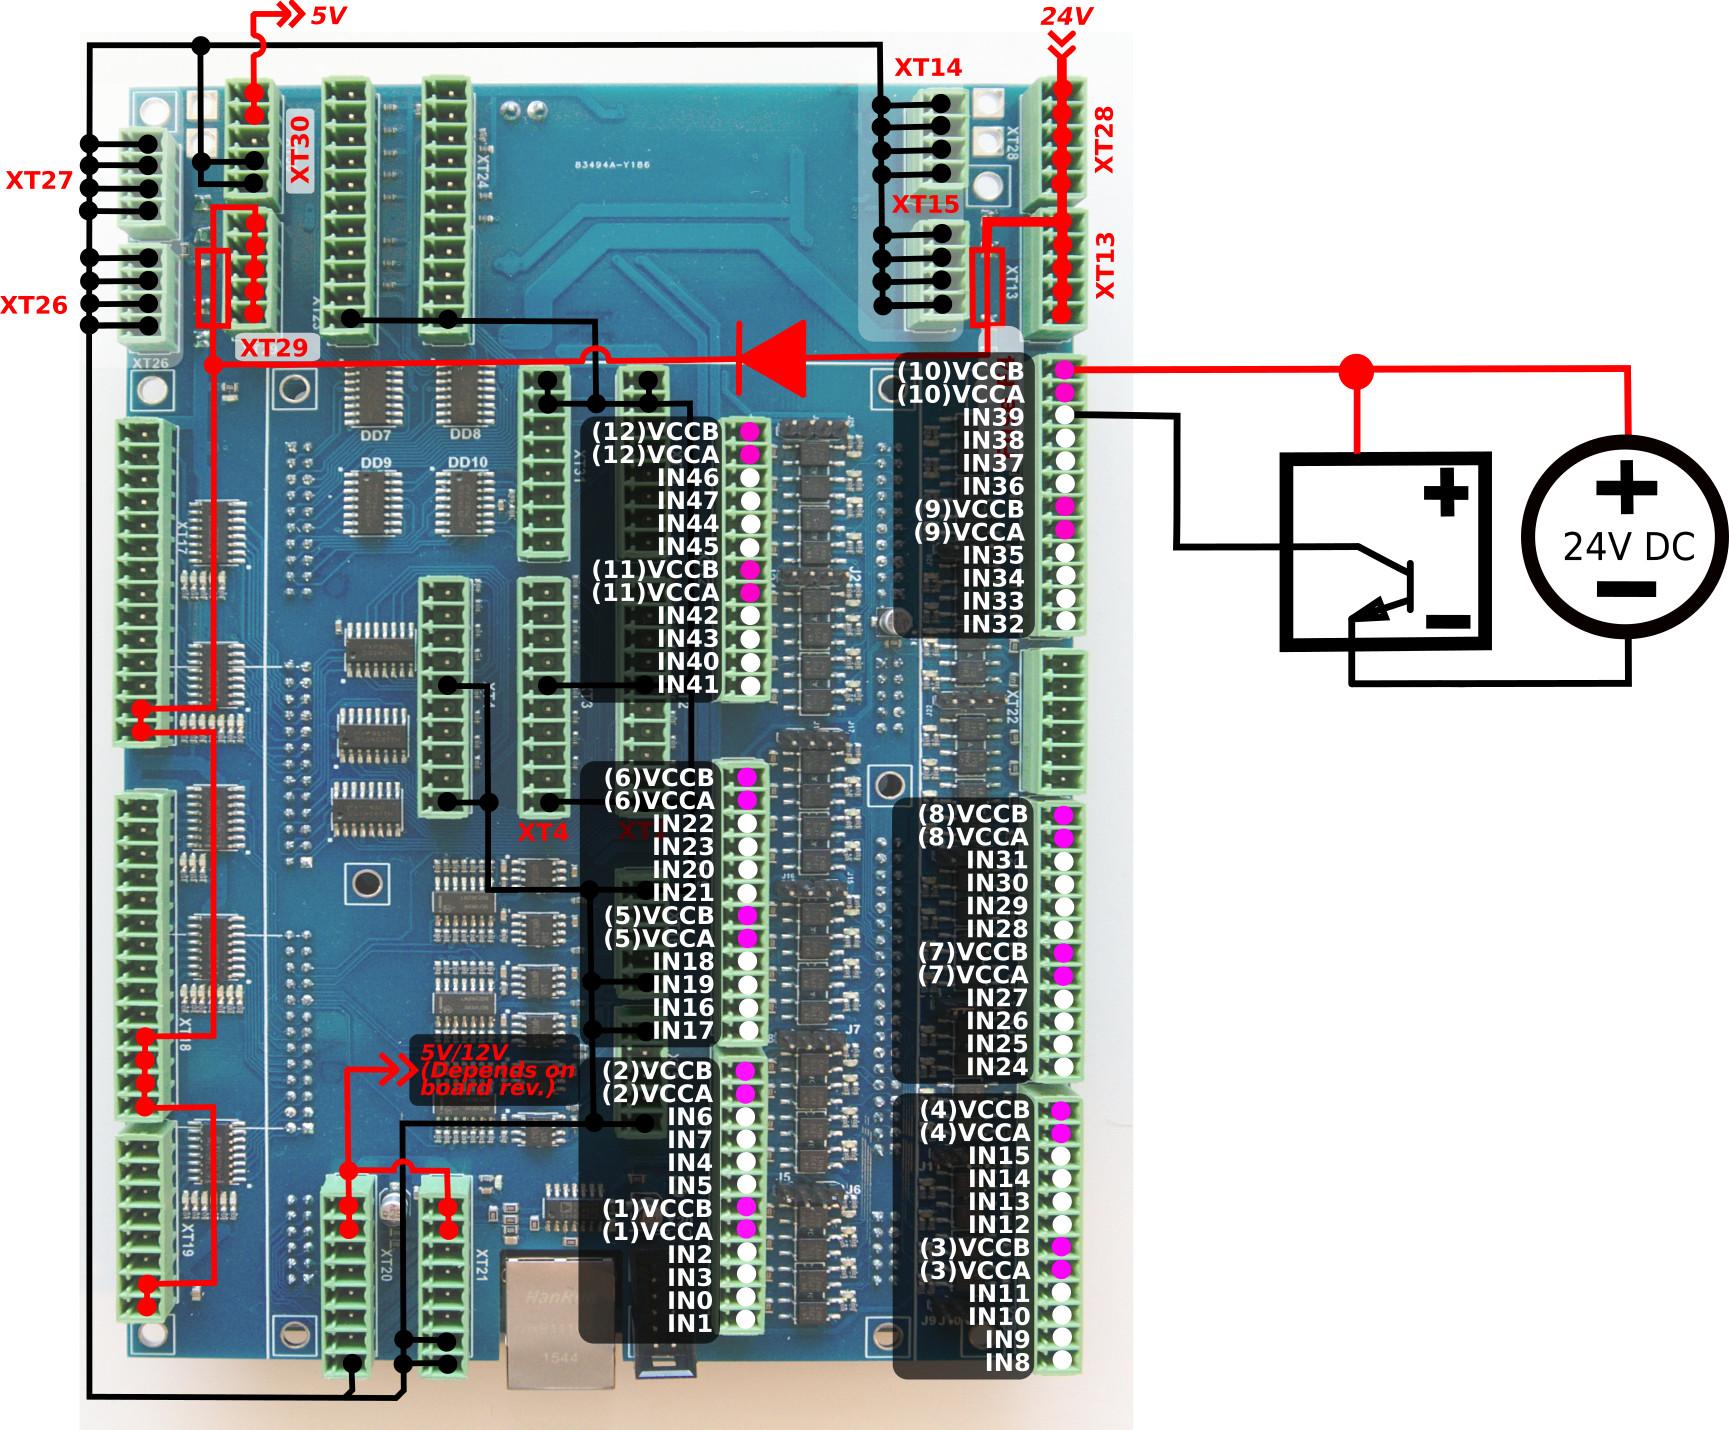 et10-j27-007-npn-external.jpg